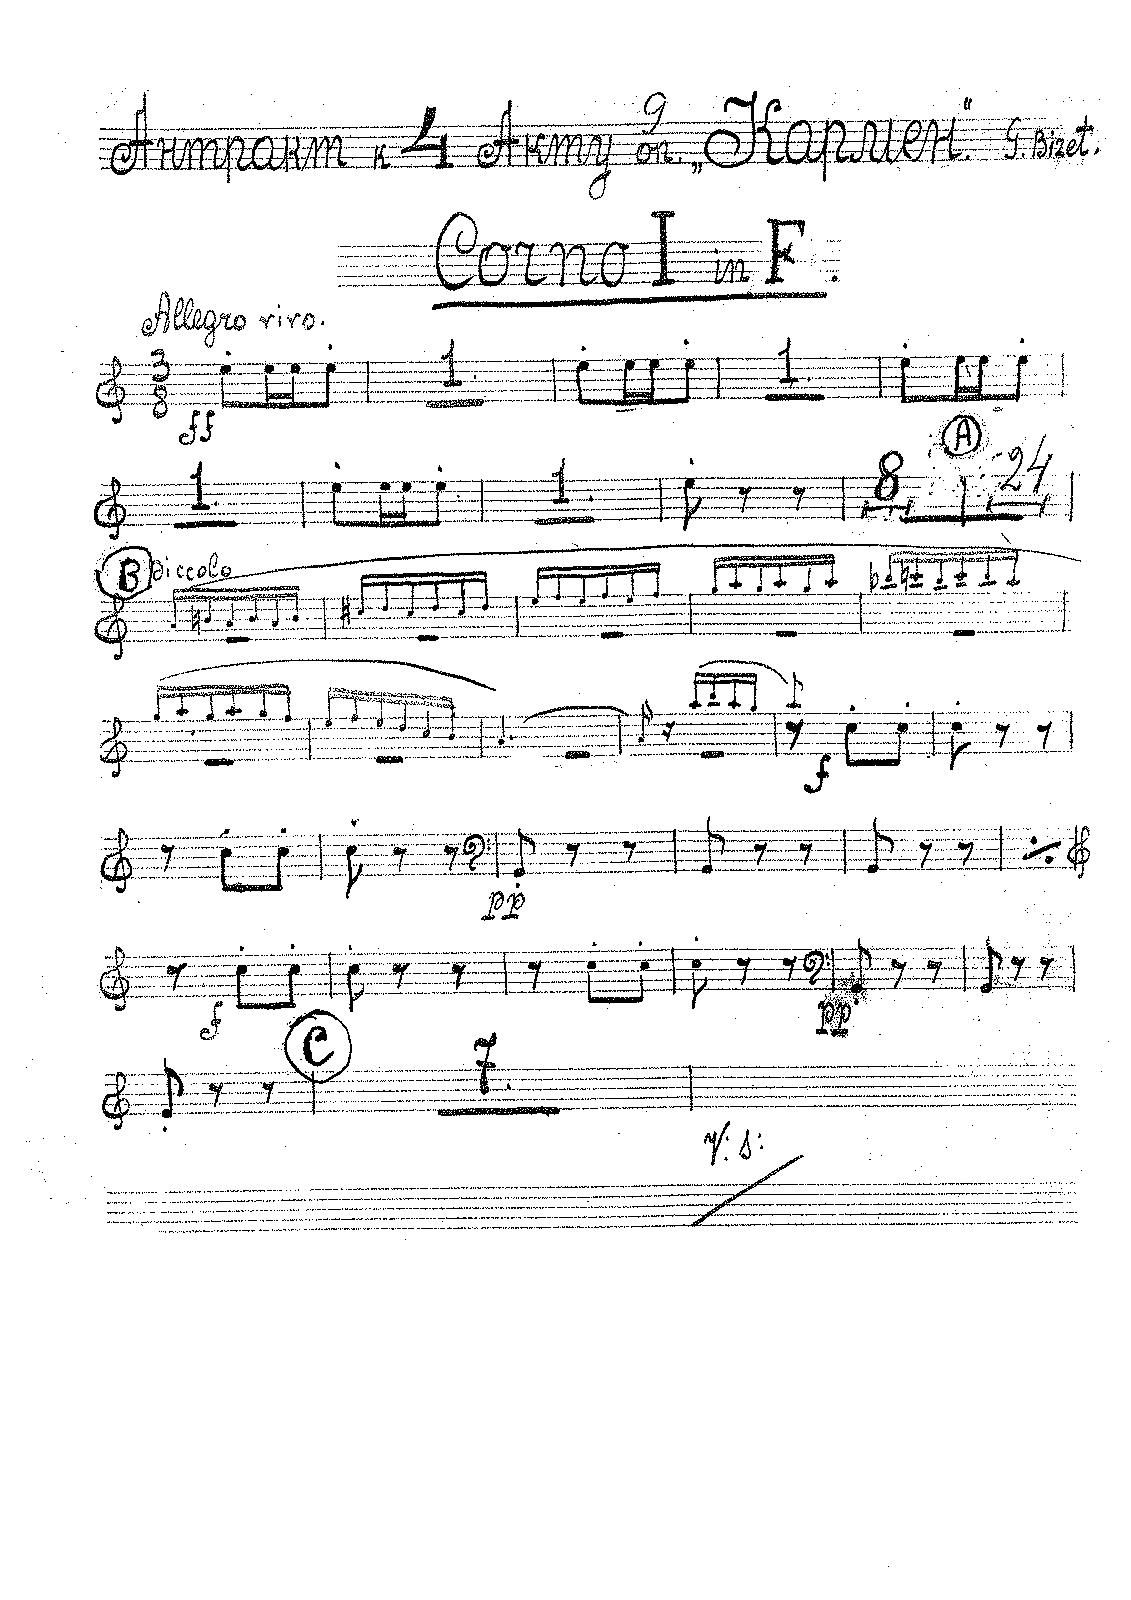 habanera carmen sheet music pdf